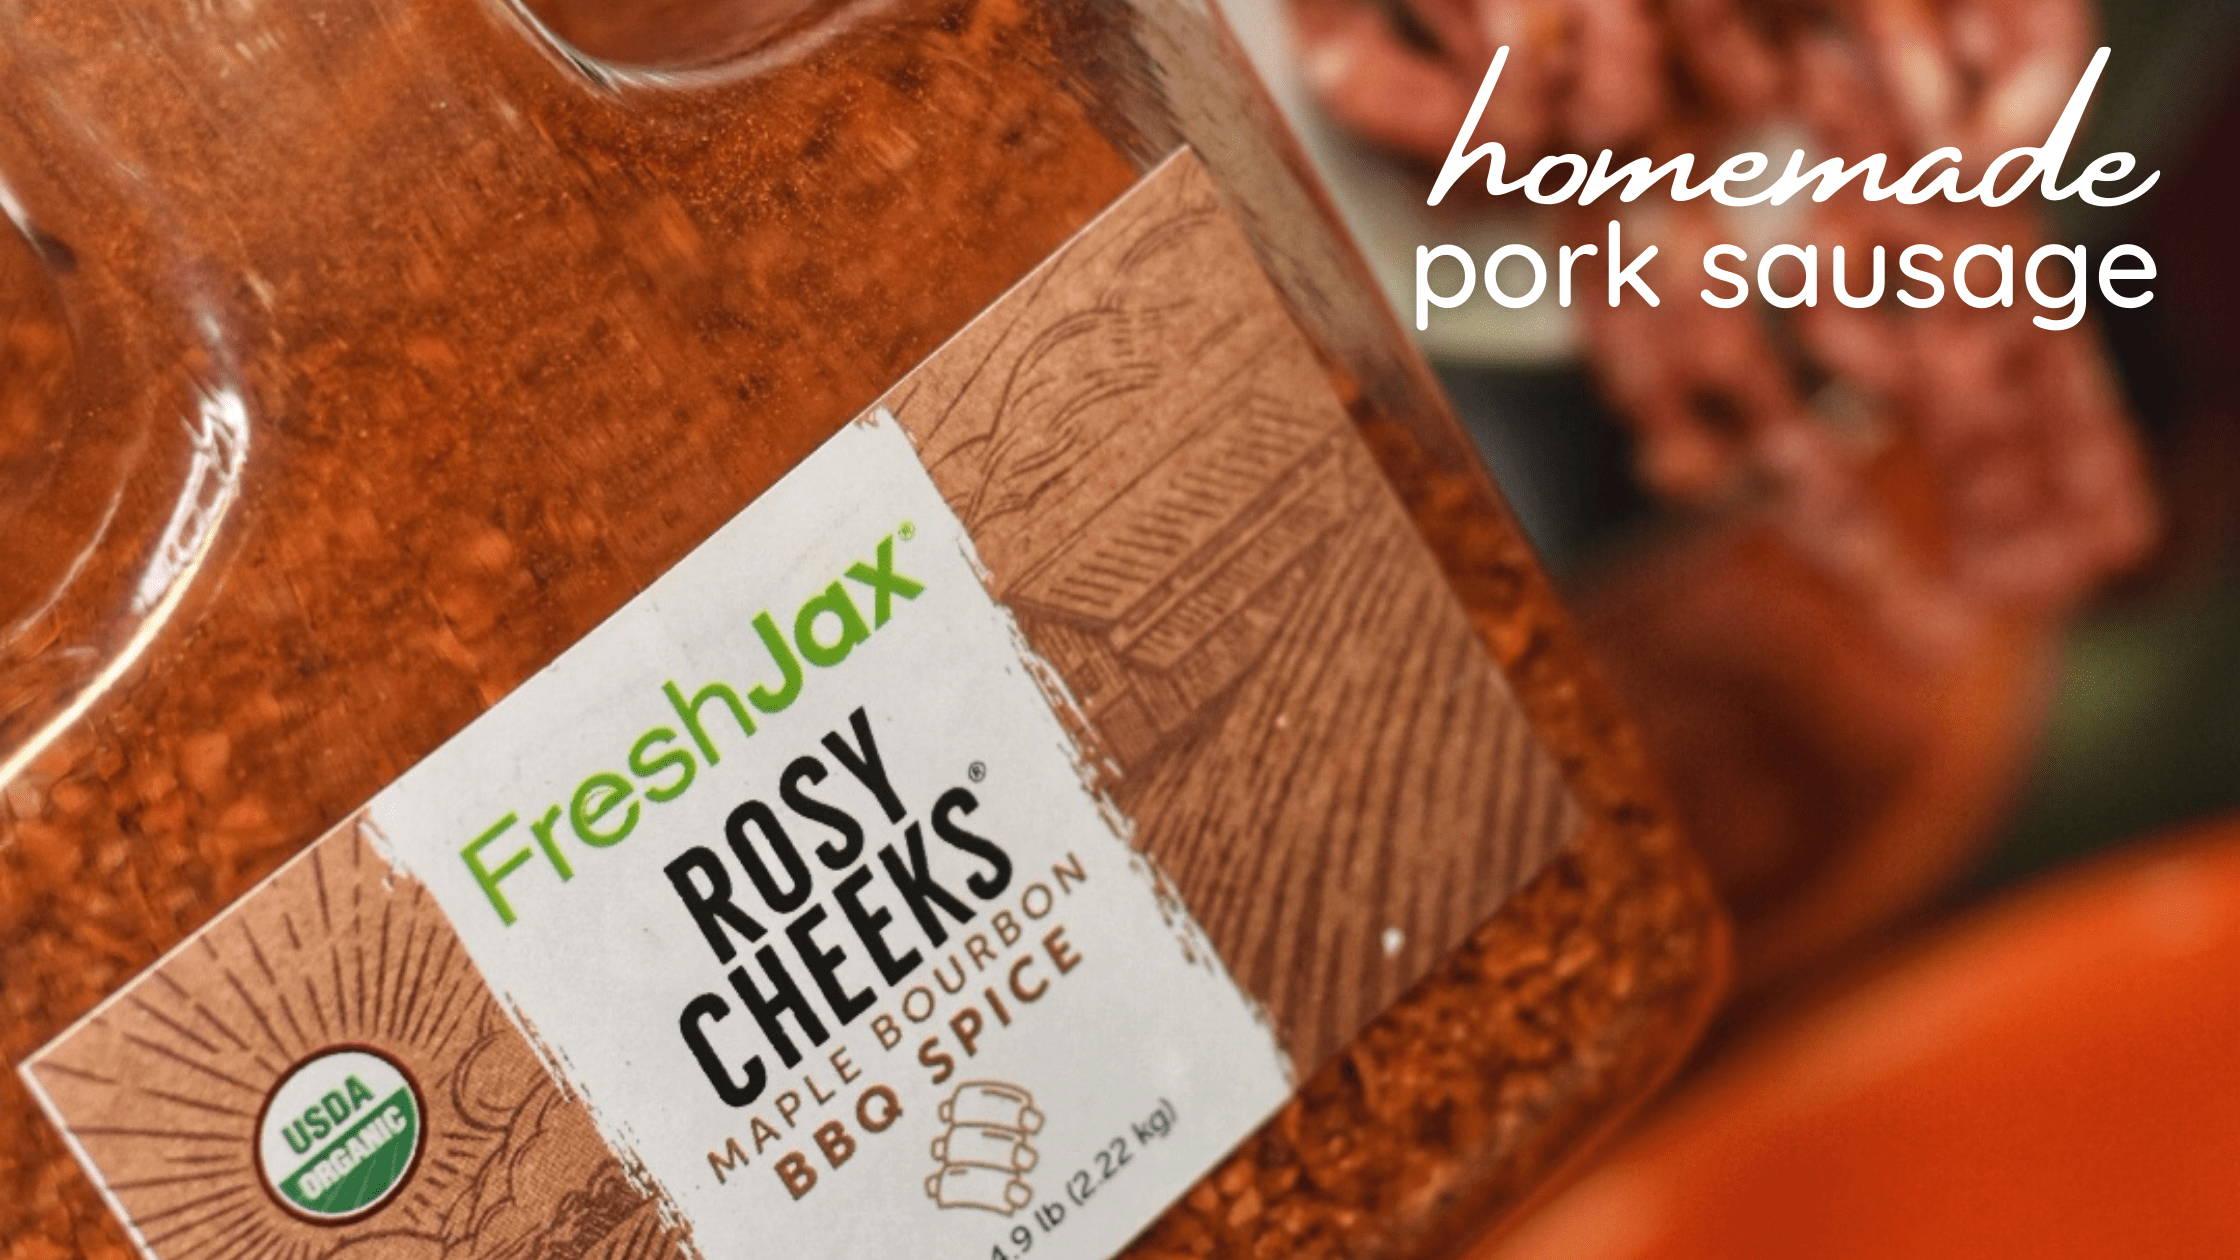 Organic Rosy Cheeks Maple bourbon bbq rub for pork sausage recipe